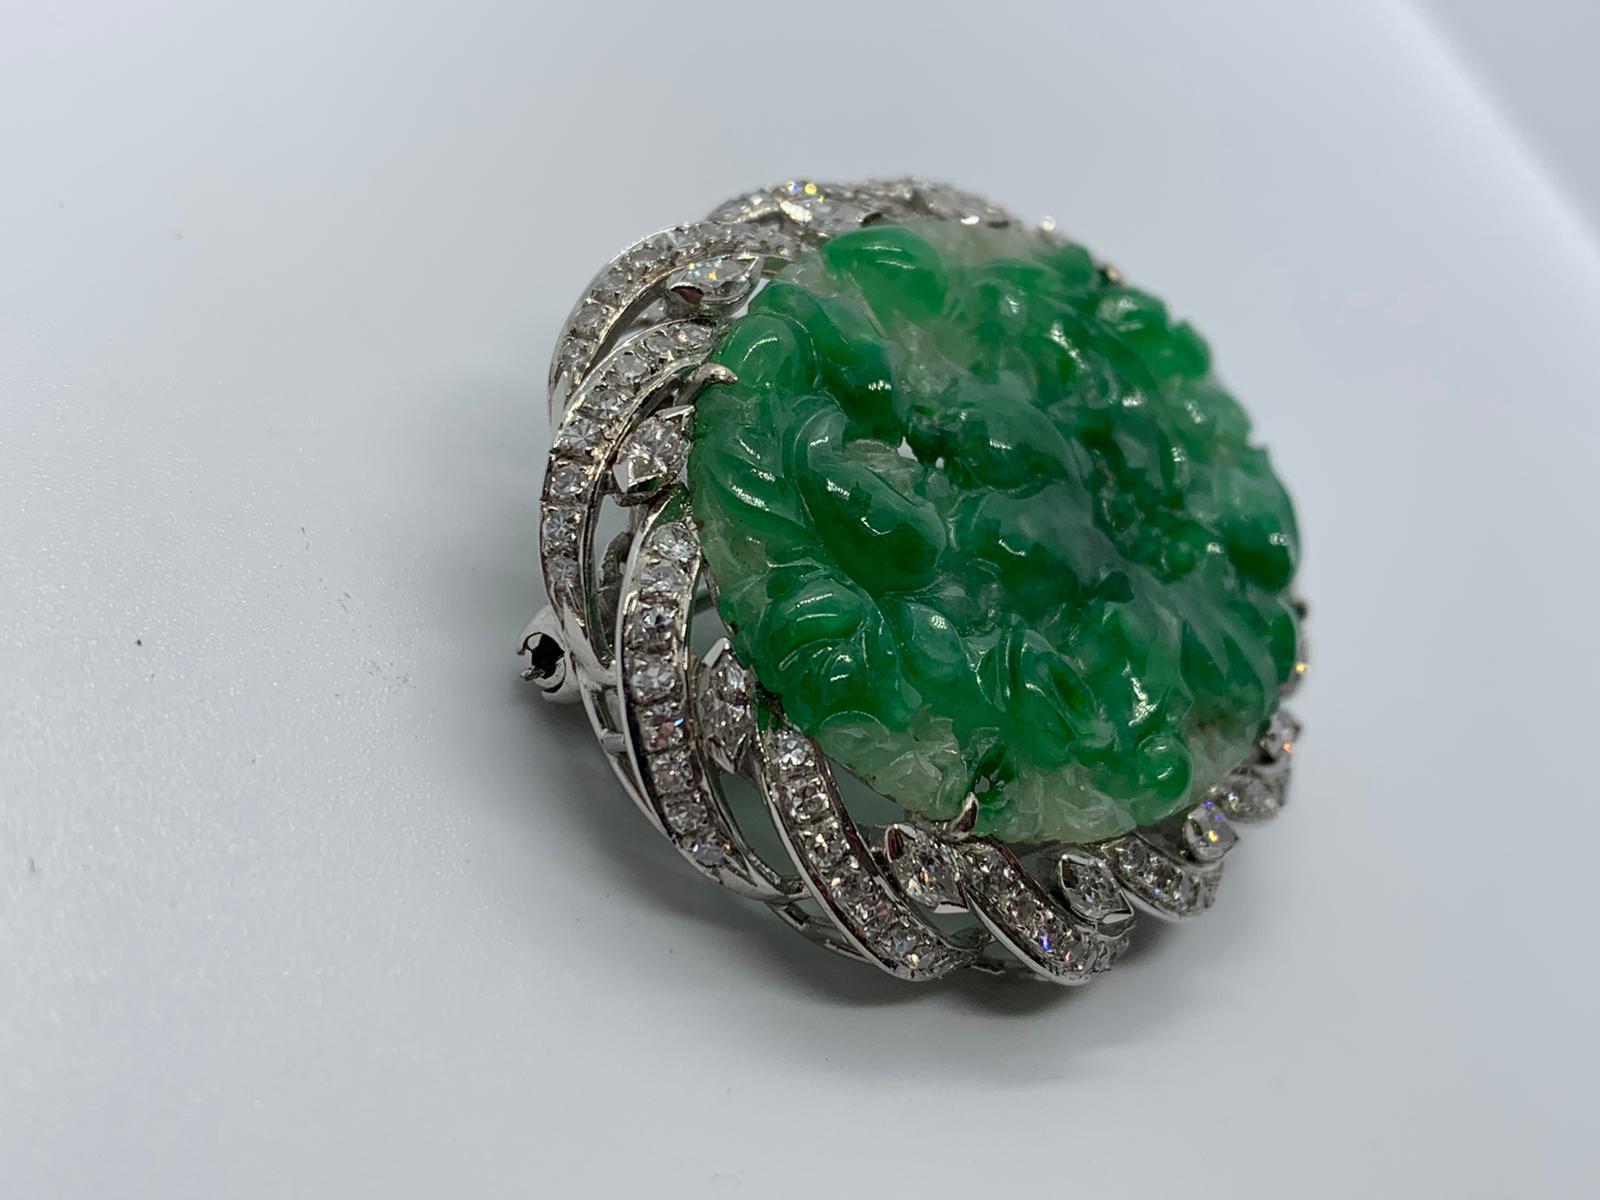 Lot 11 - 18ct white gold jade & diamond brooch